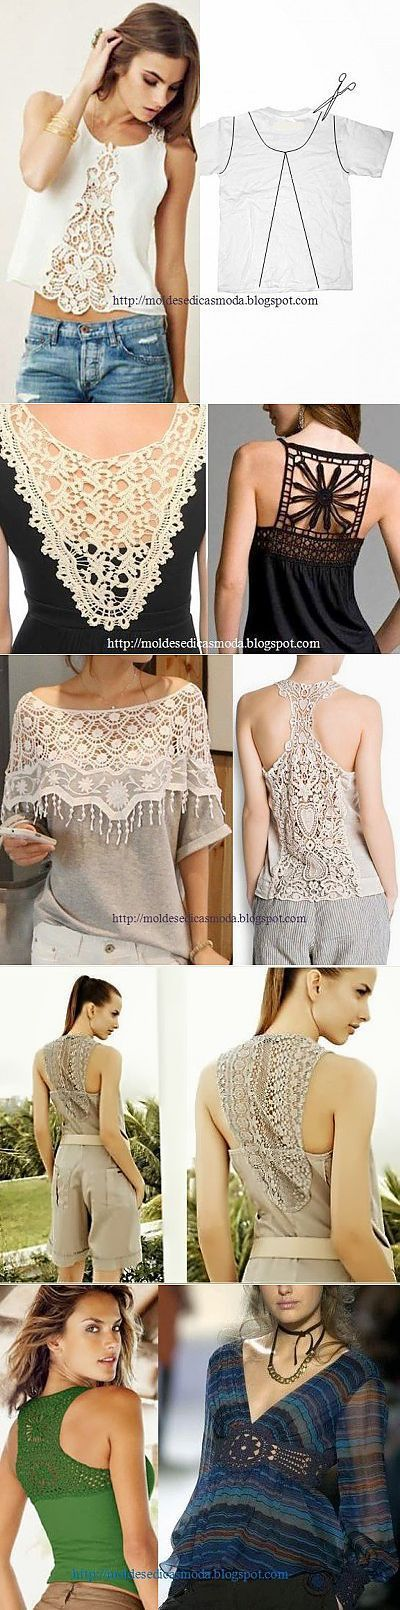 Idee alterazioni abbigliamento   Varvarushka-Needlewoman   шьем быстро и легко   Постила